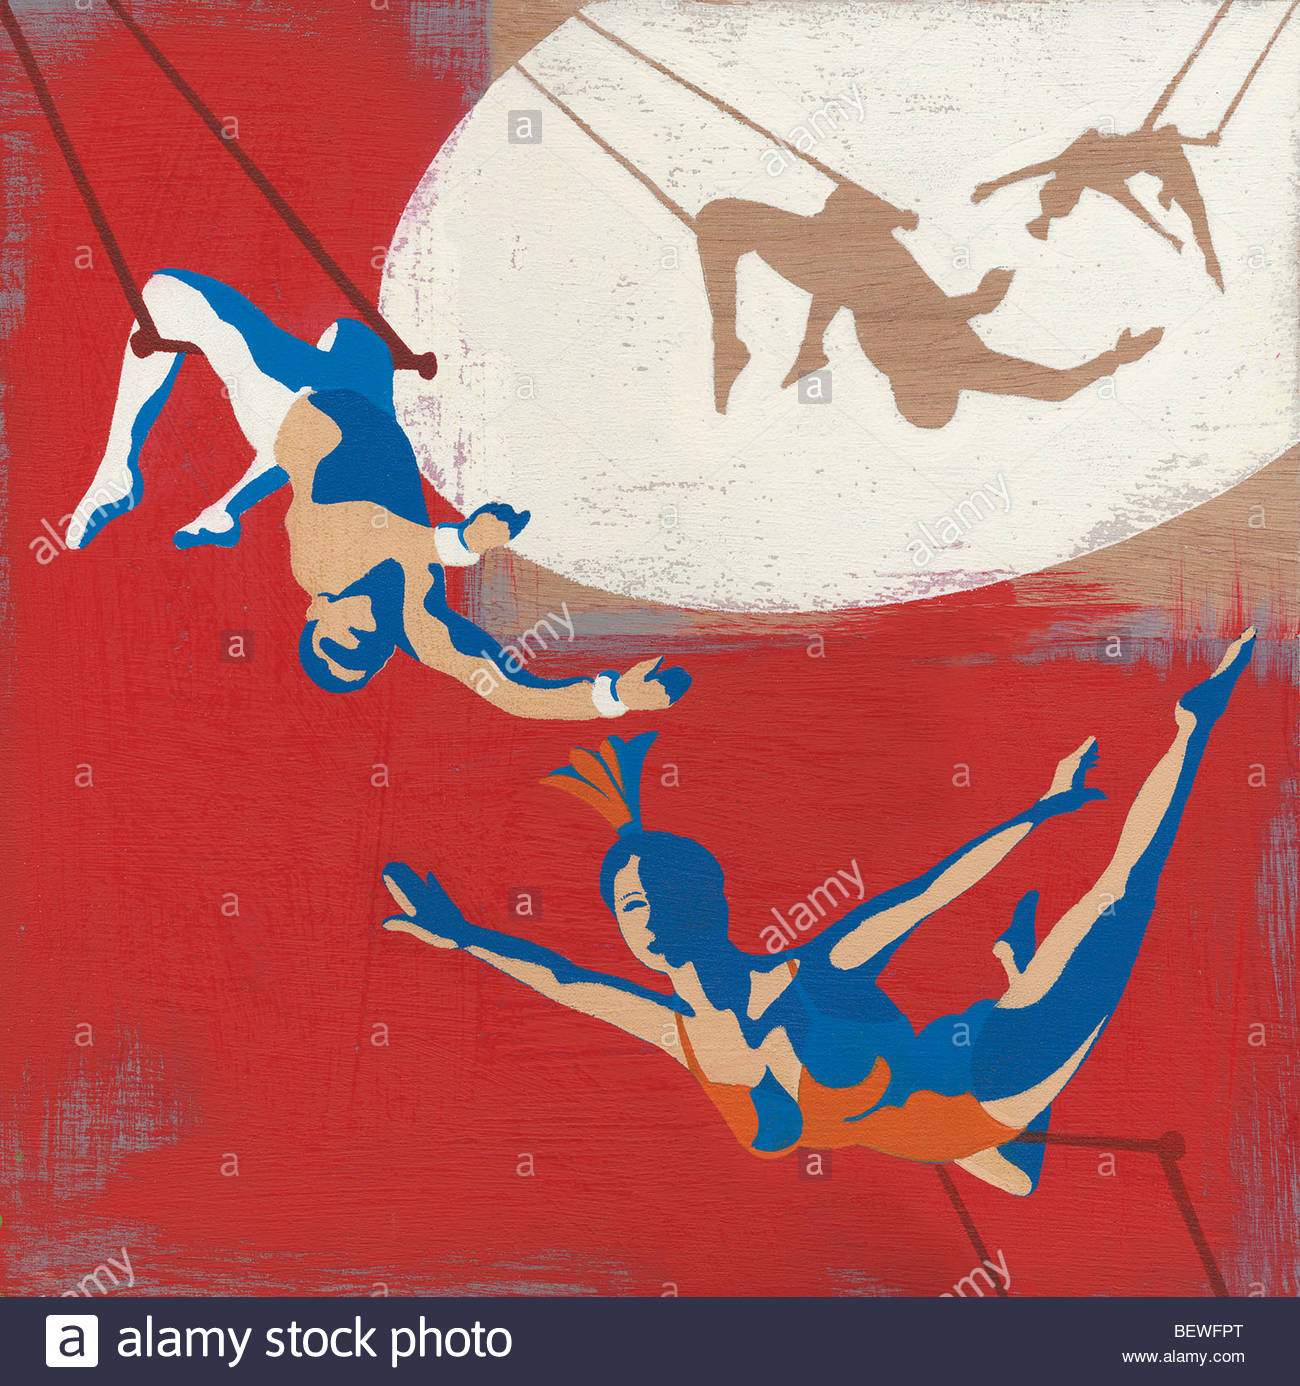 Trapeze artists swinging on trapeze - Stock Image